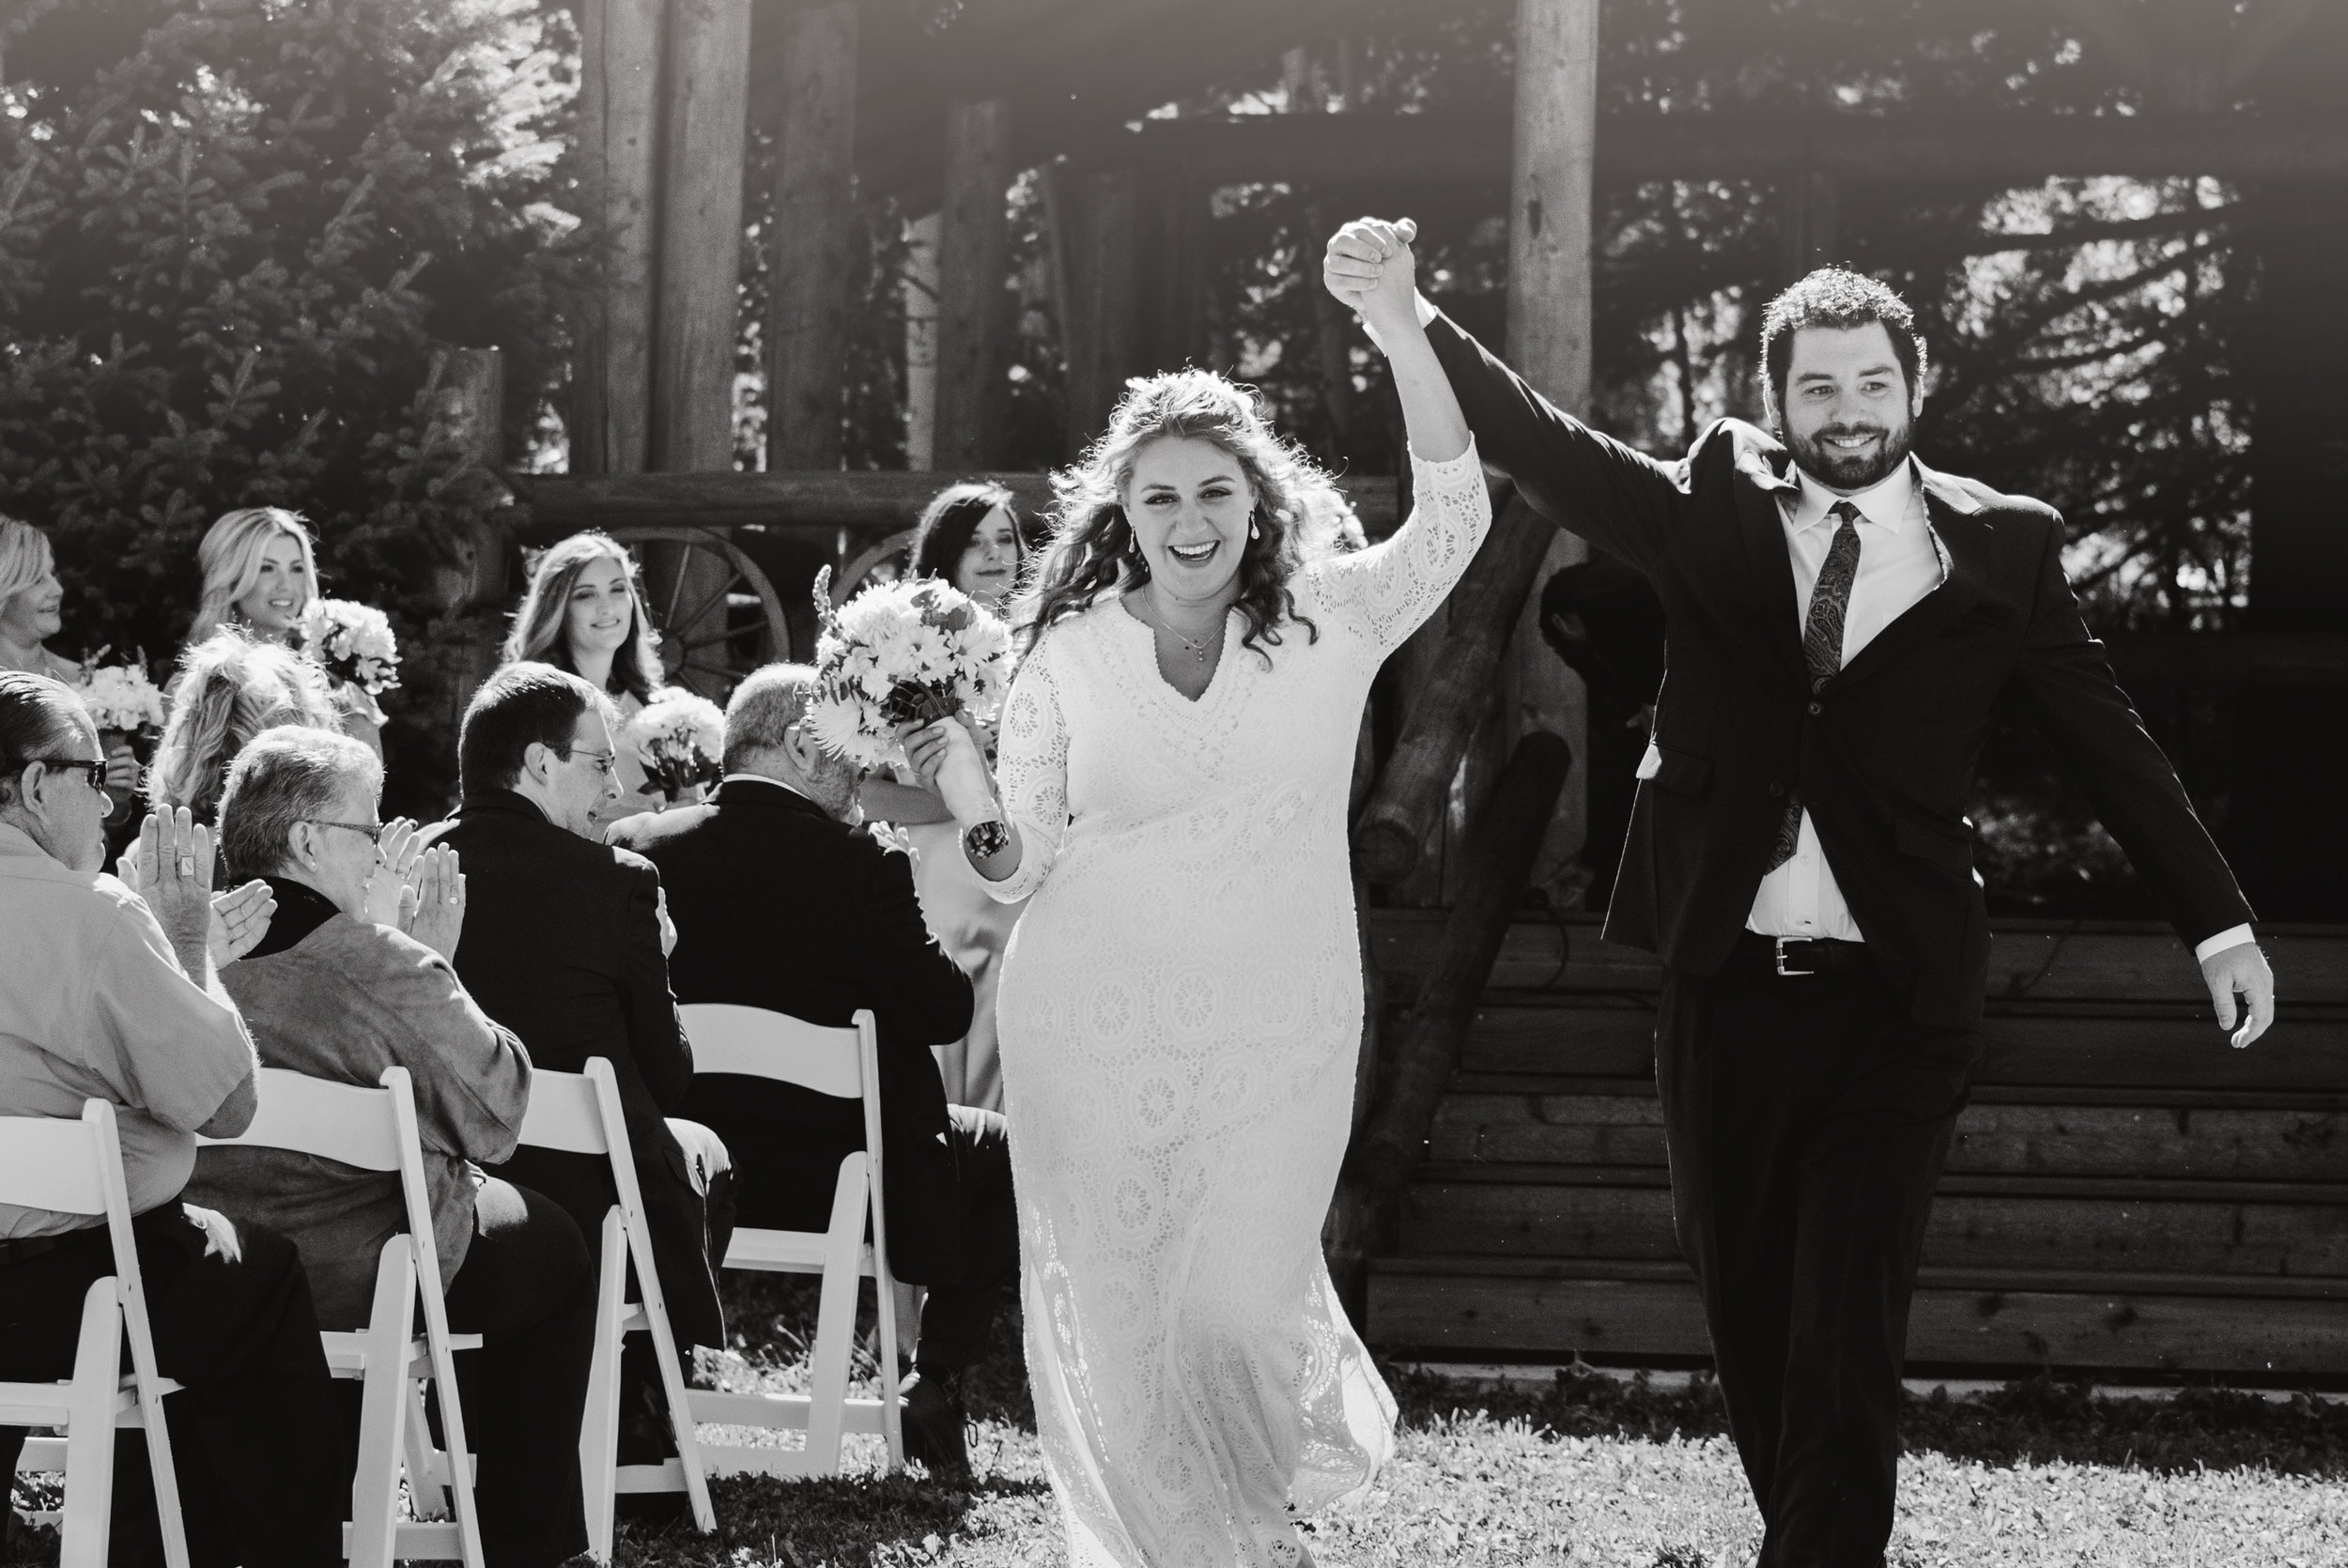 Northern California Offbeat Unconventional Wedding and Portrait Photographer Kate Donaldson captures a handmade Colorado Wedding